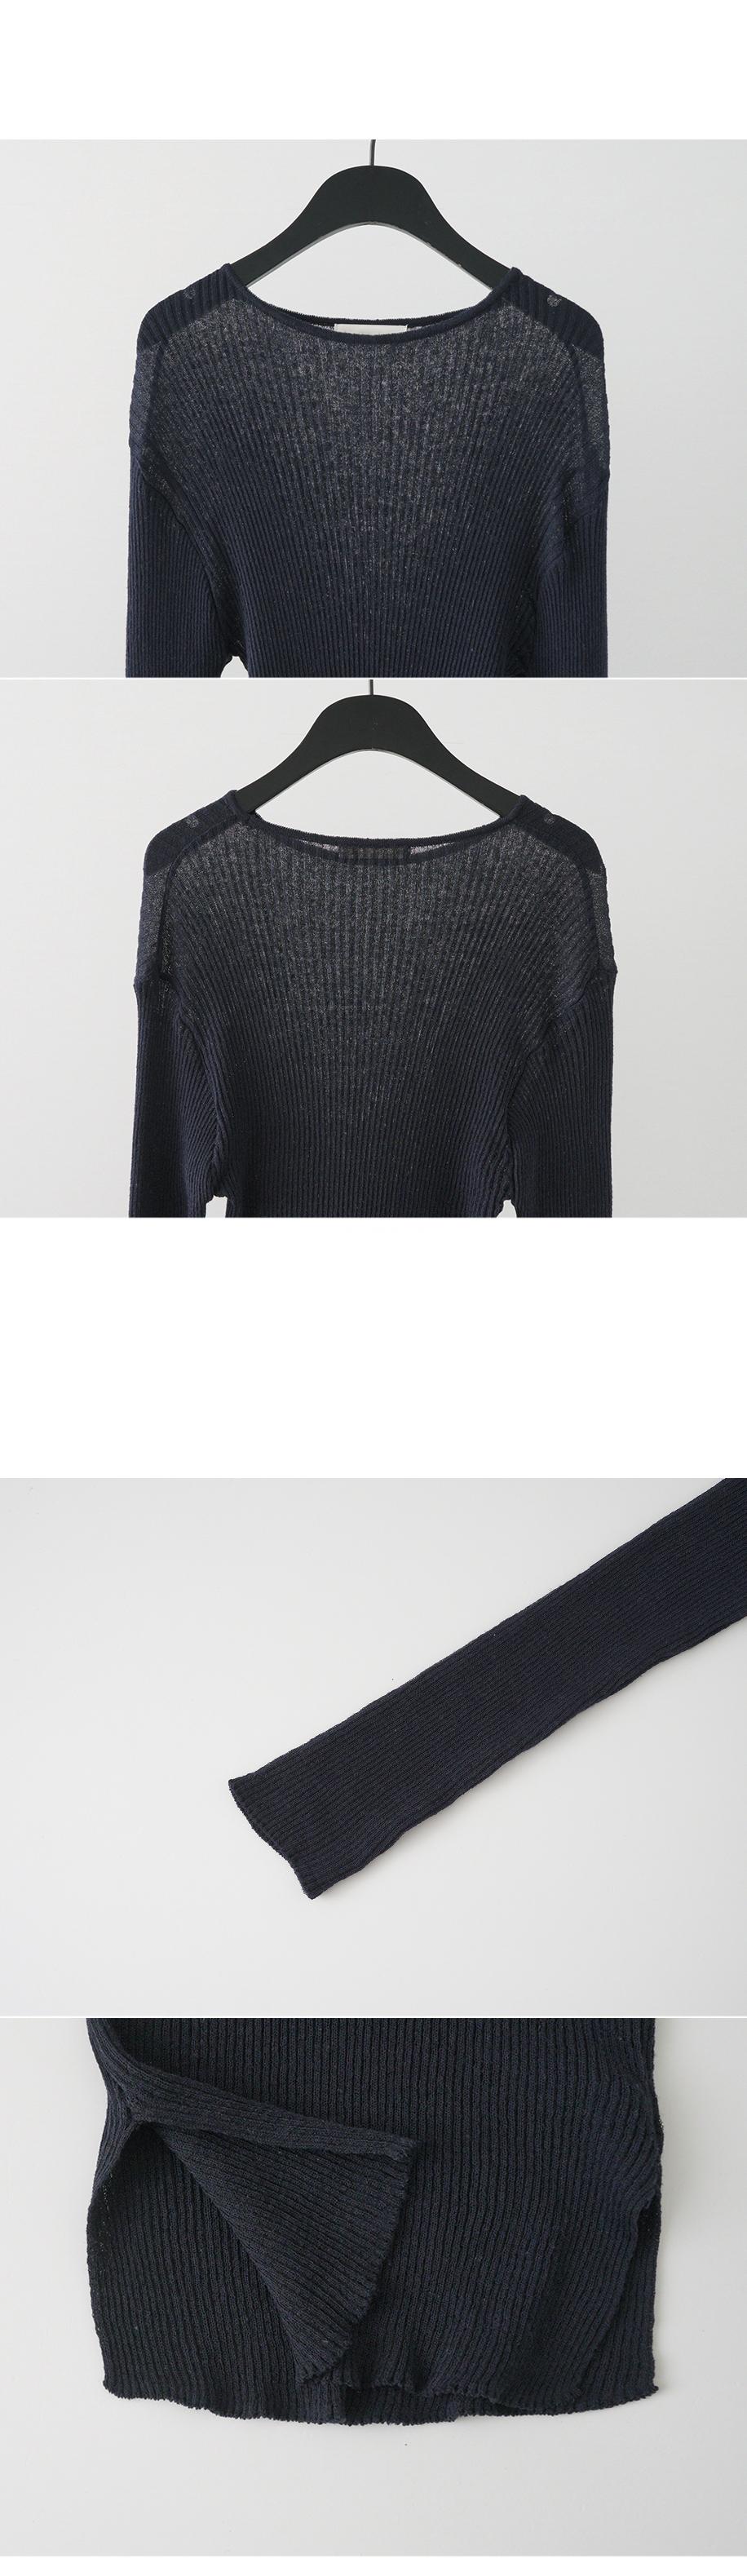 line slit knit